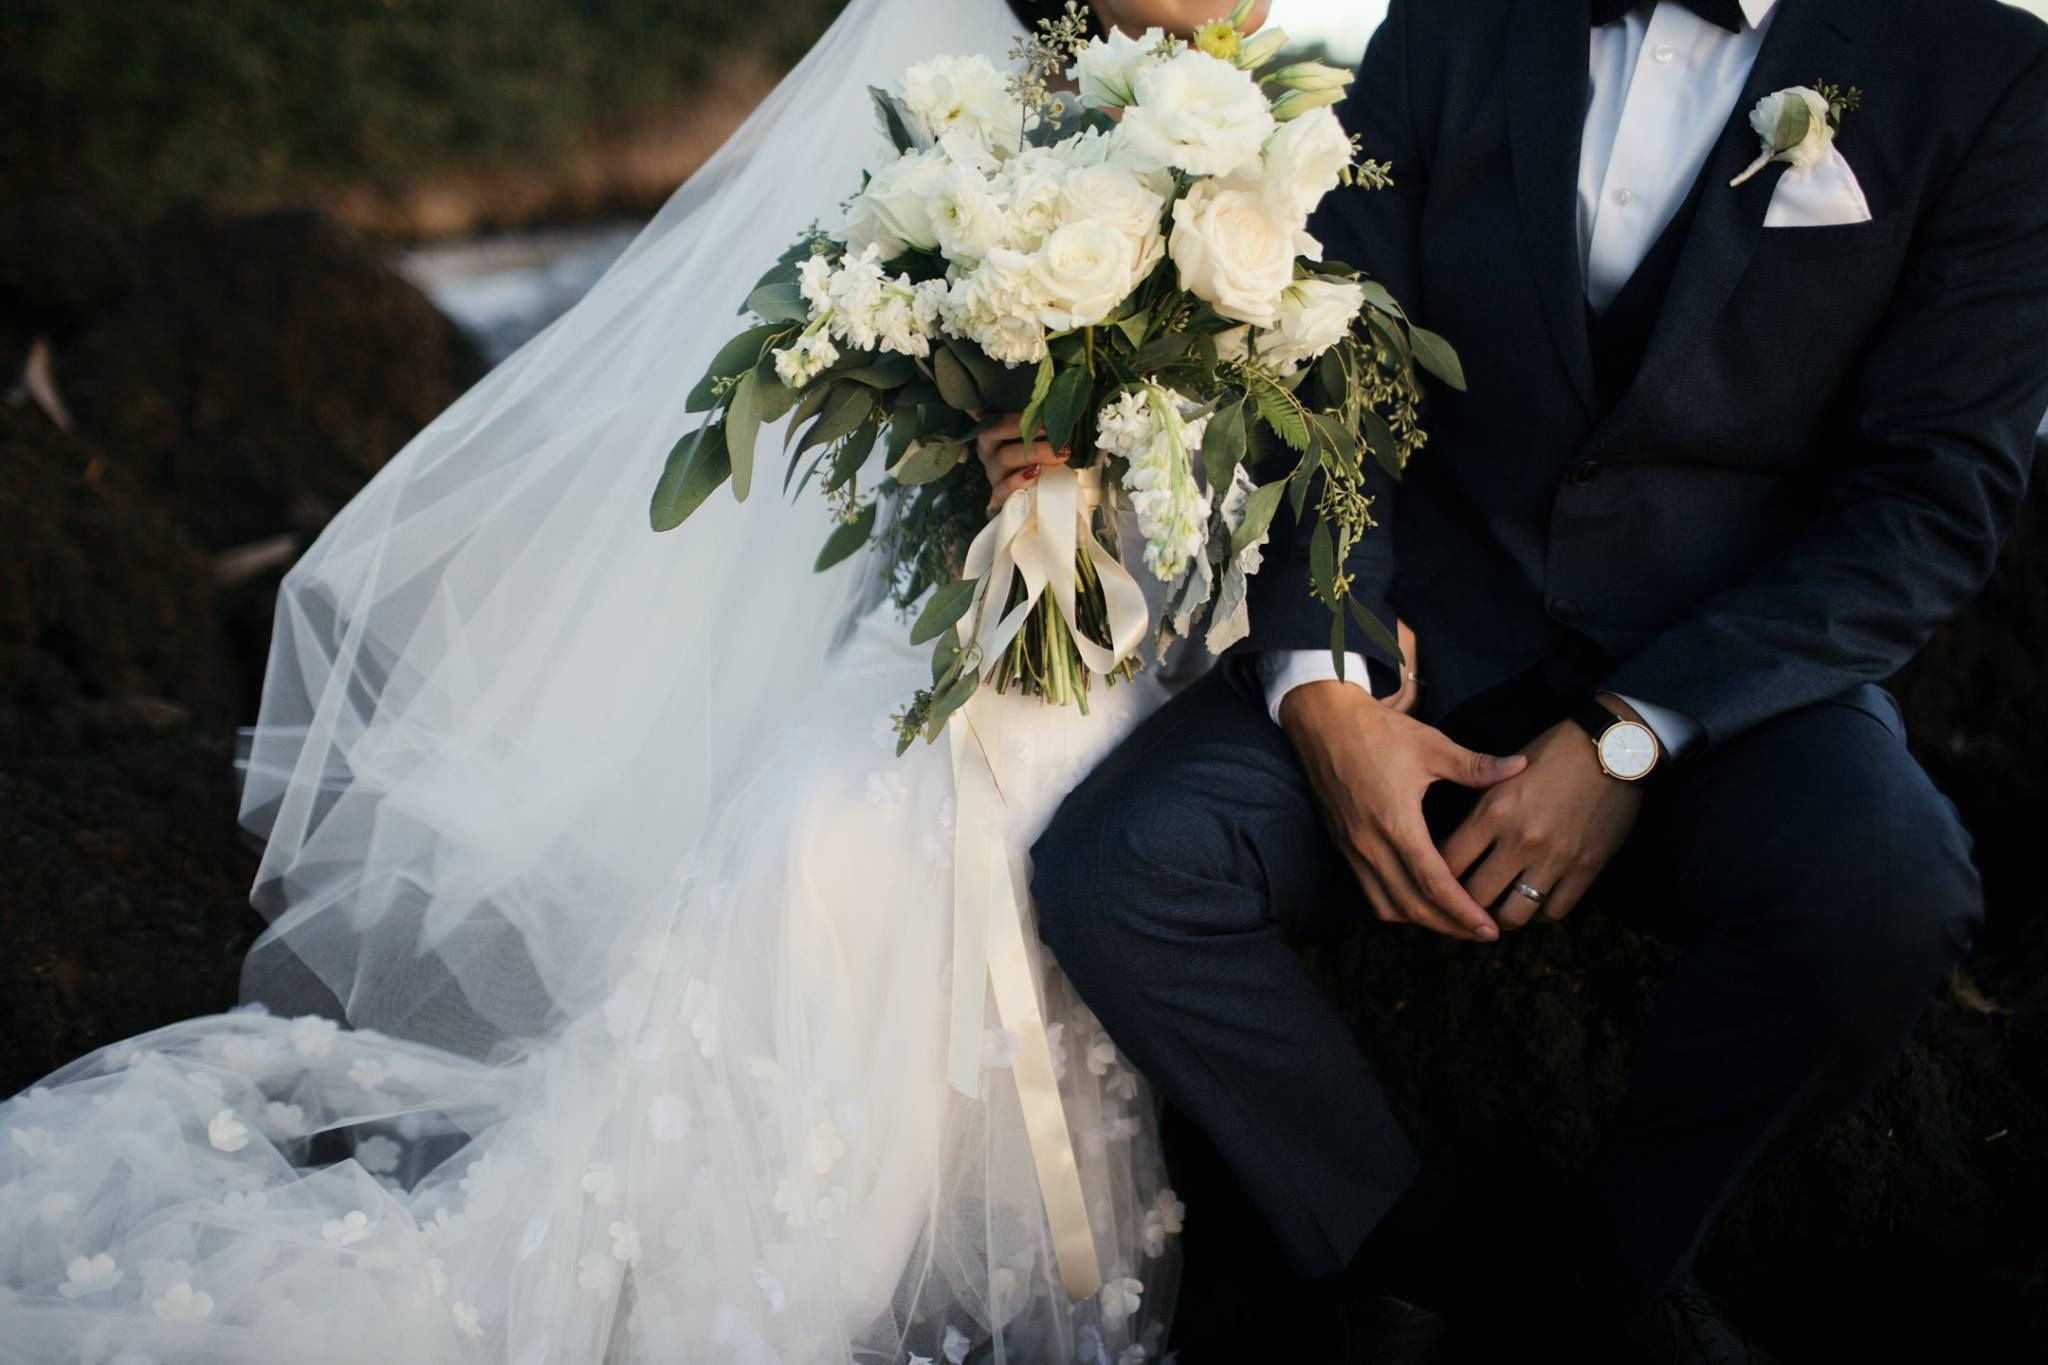 Ivory bridal bouquet by dellables unique lace wedding dress and